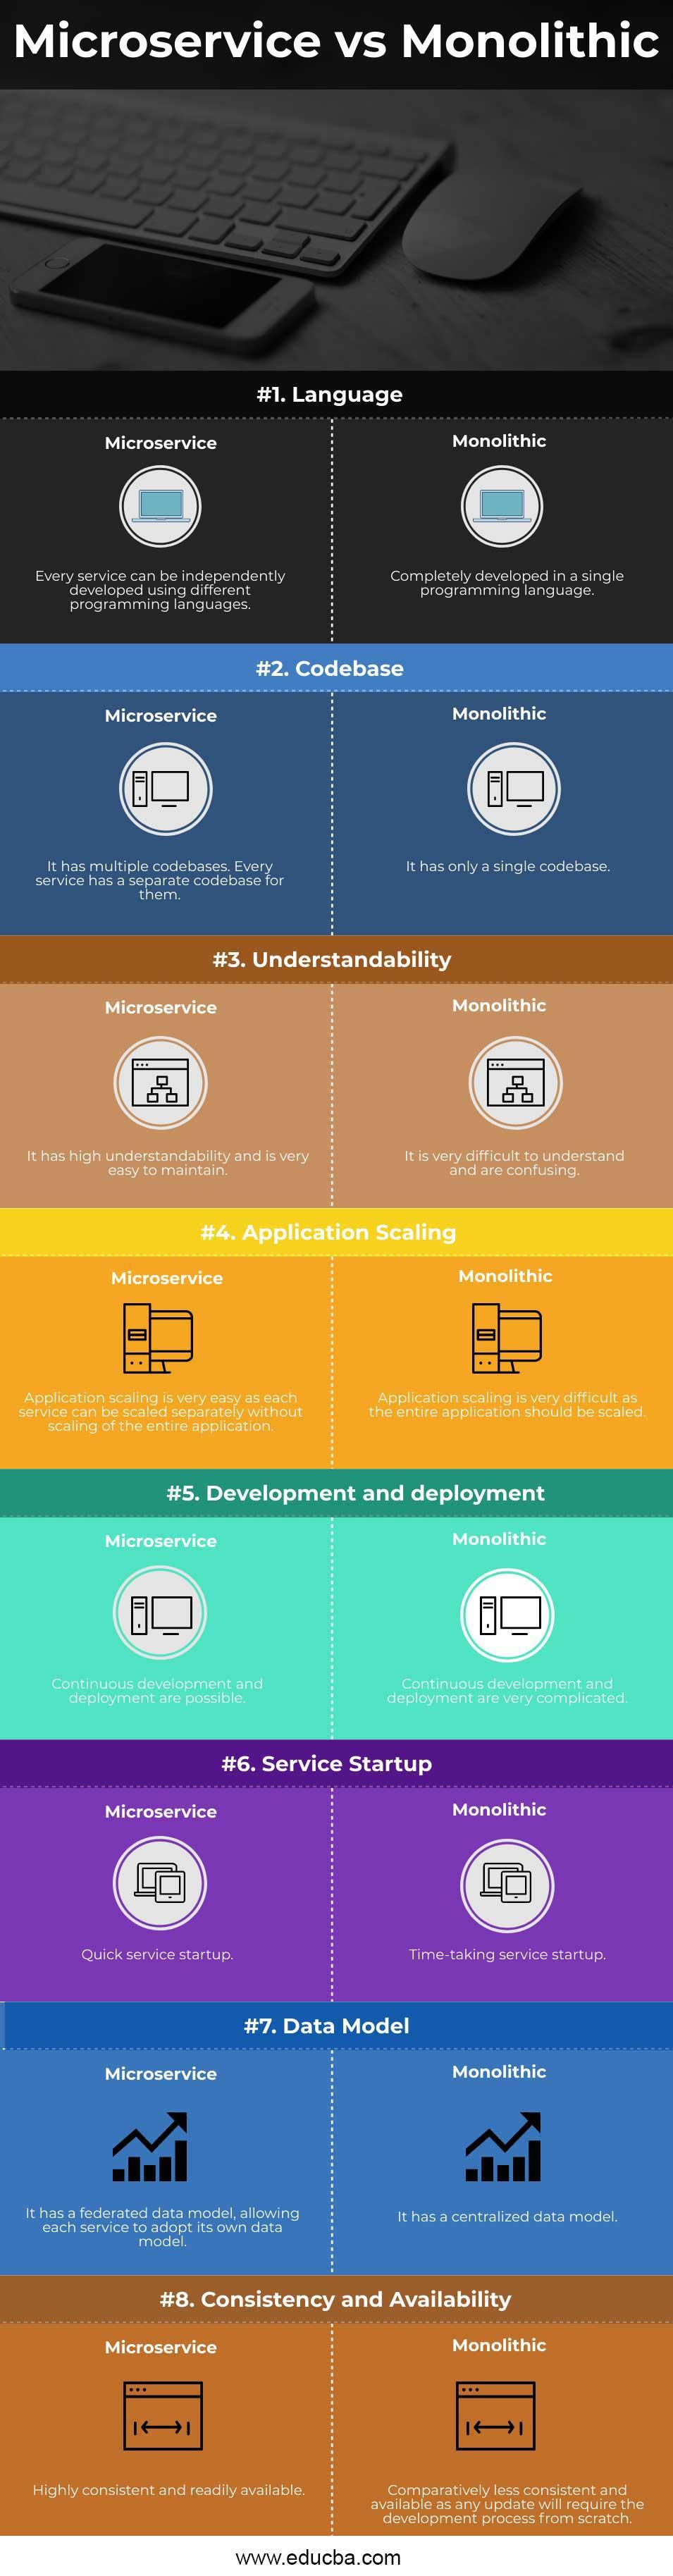 Microservice-vs-Monolithic-info